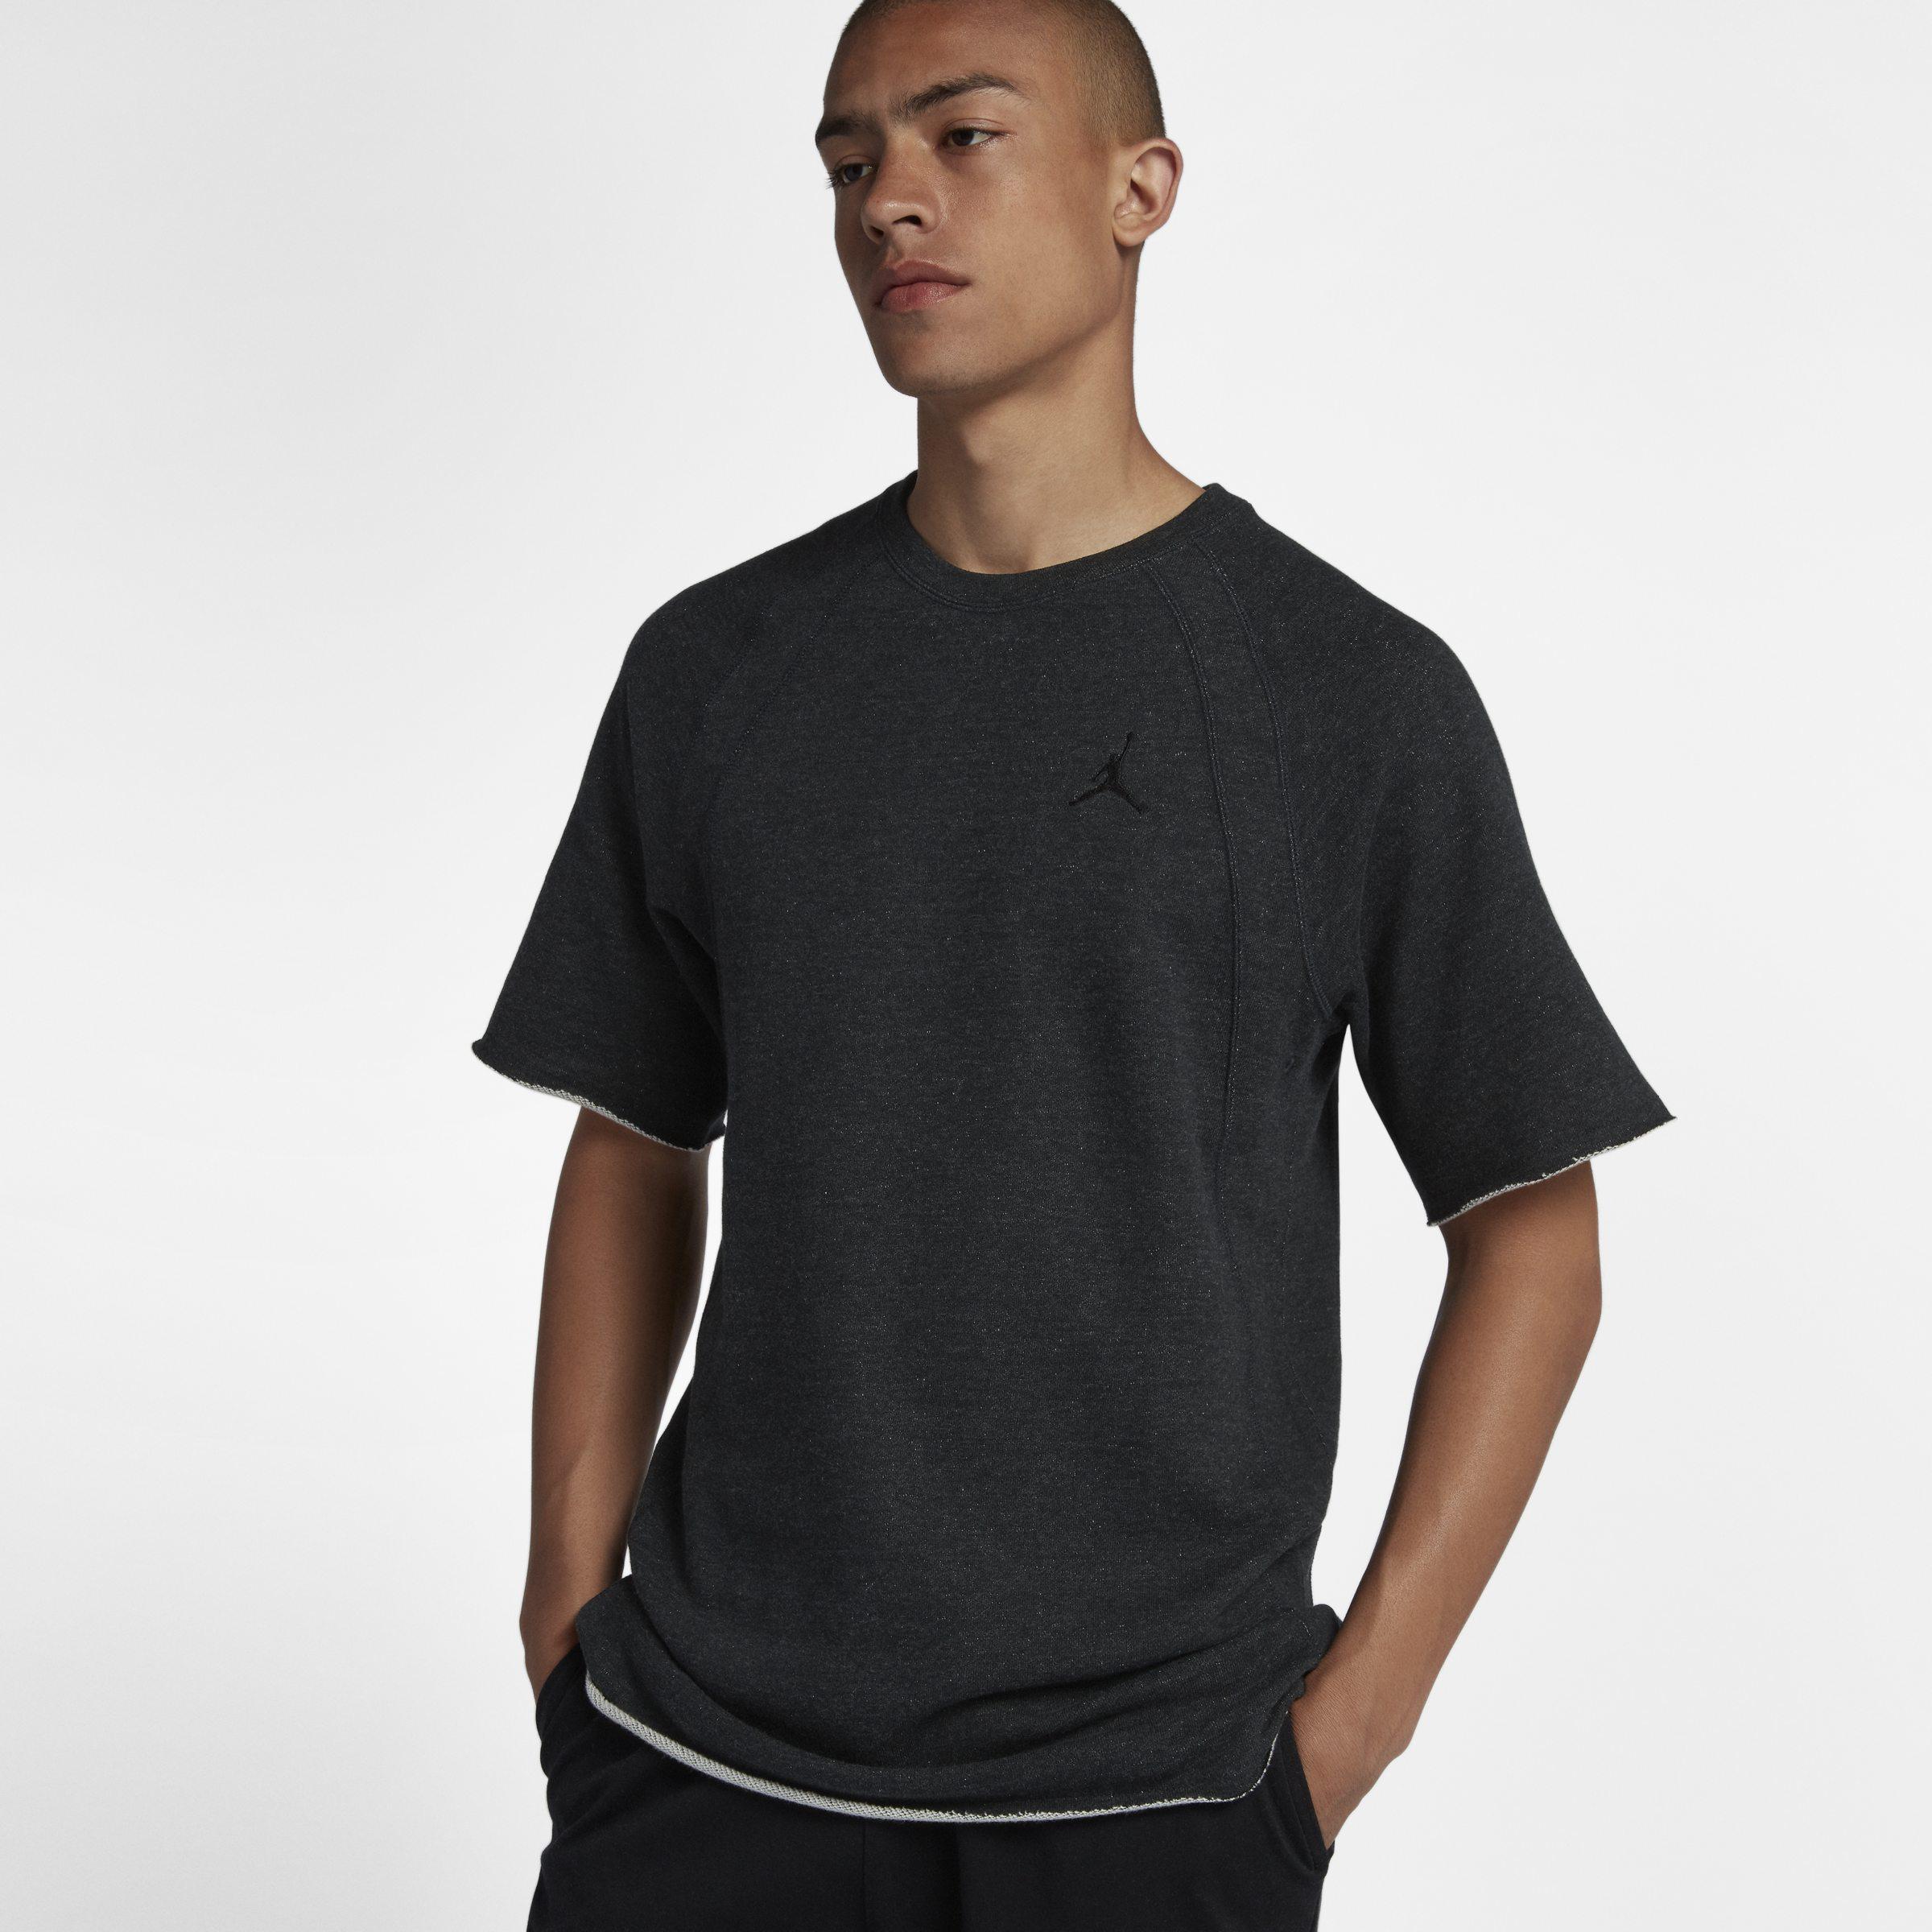 9d97132f7725 Nike Jordan Lifestyle Wings Short-sleeve Crew in Black for Men - Lyst